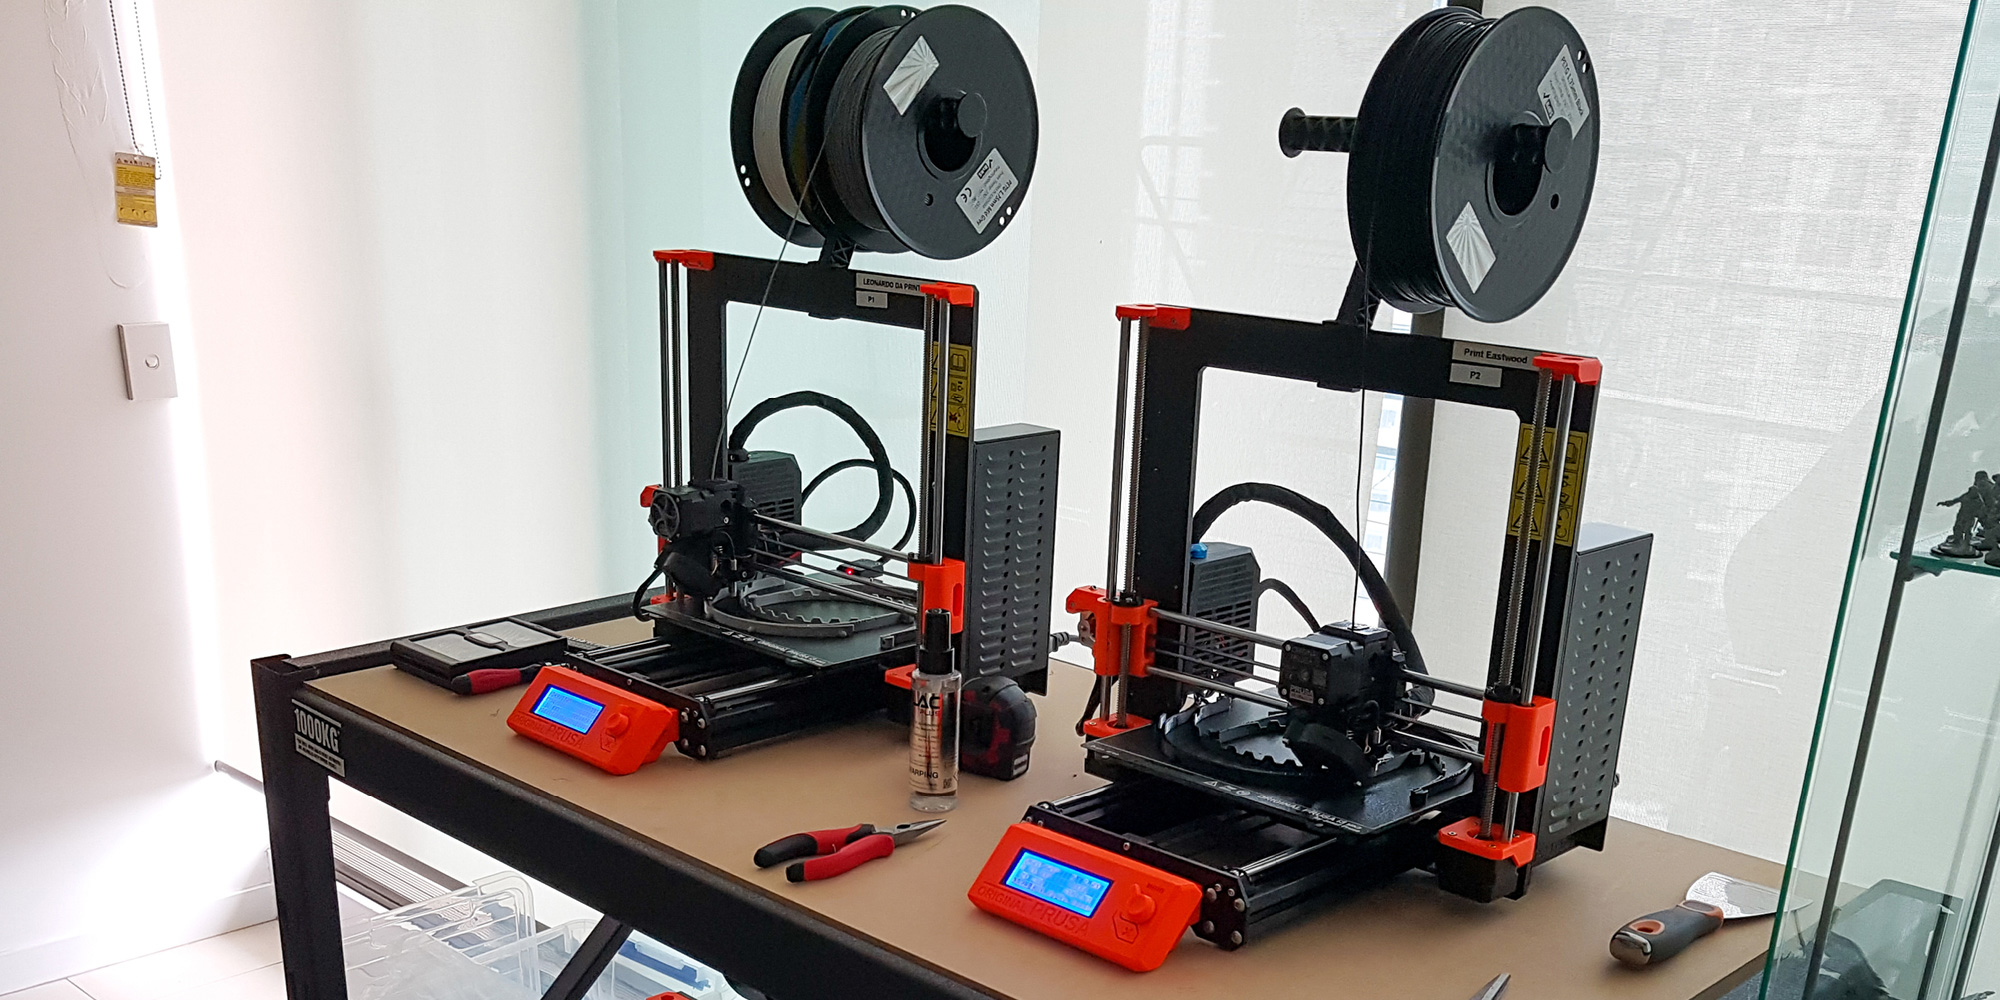 Waterline's 3D printers in action